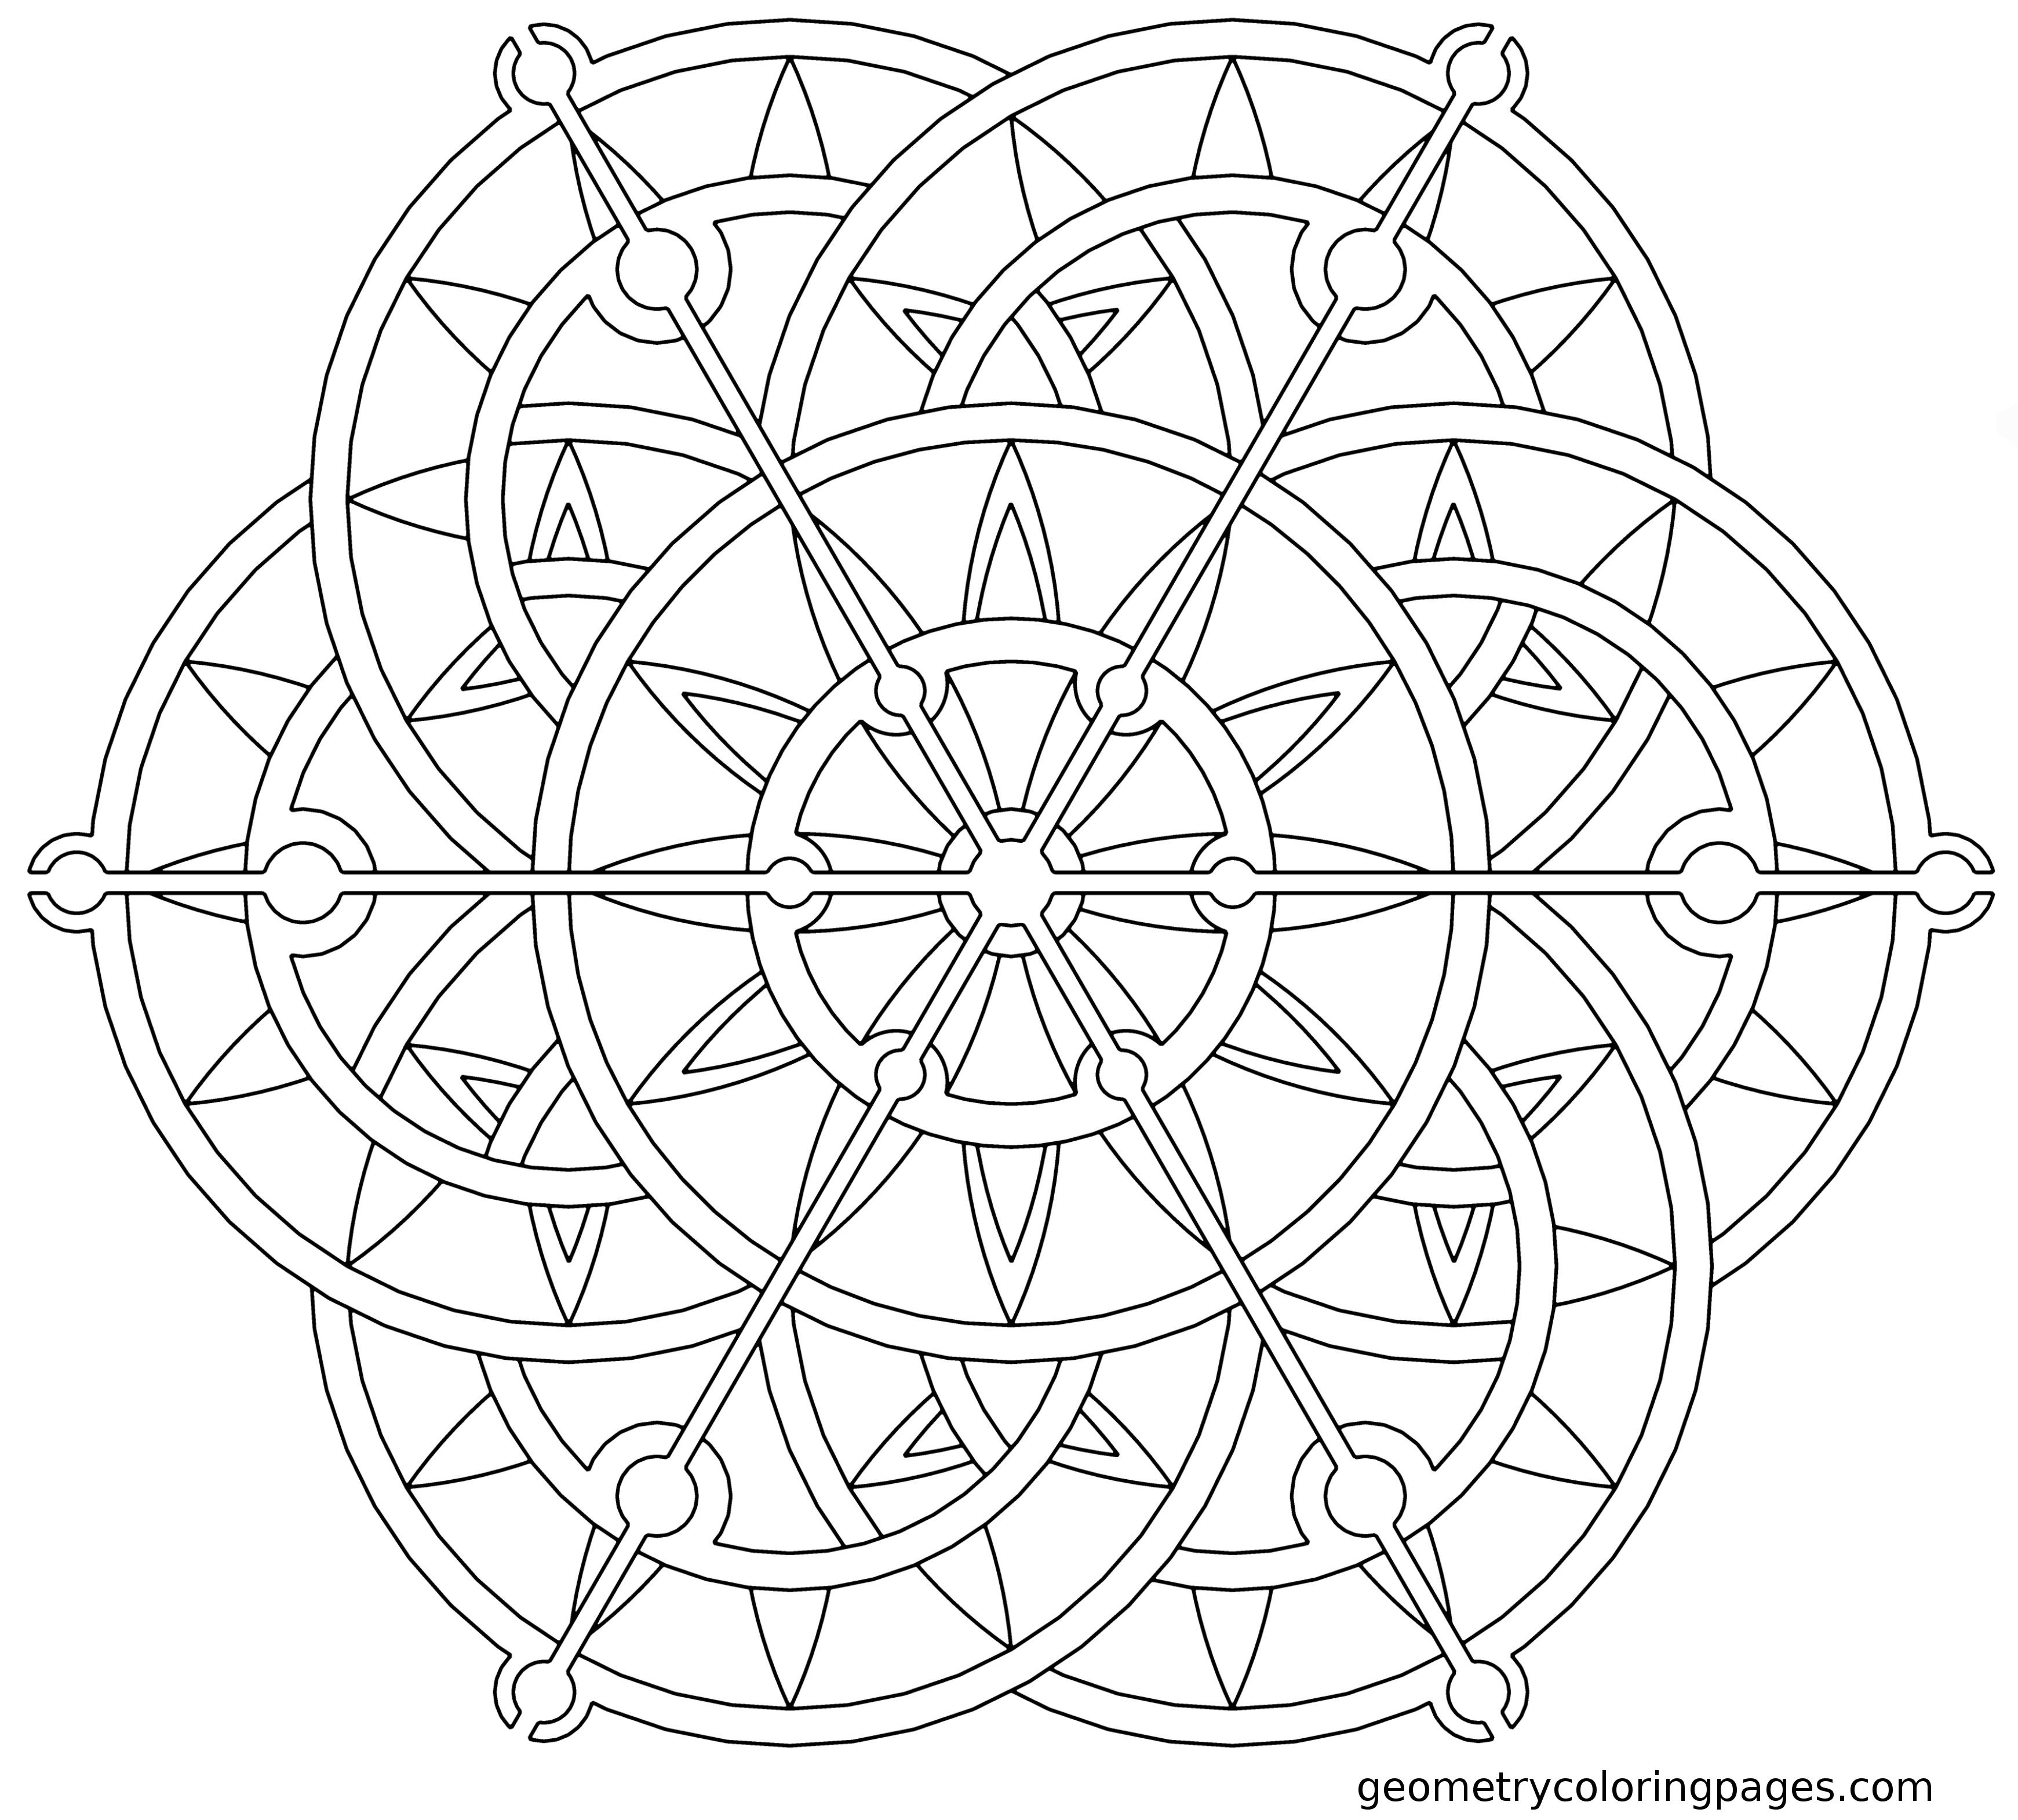 mandala geometric printable coloring pages | Geometric Mandala Coloring Pages - Coloring Home